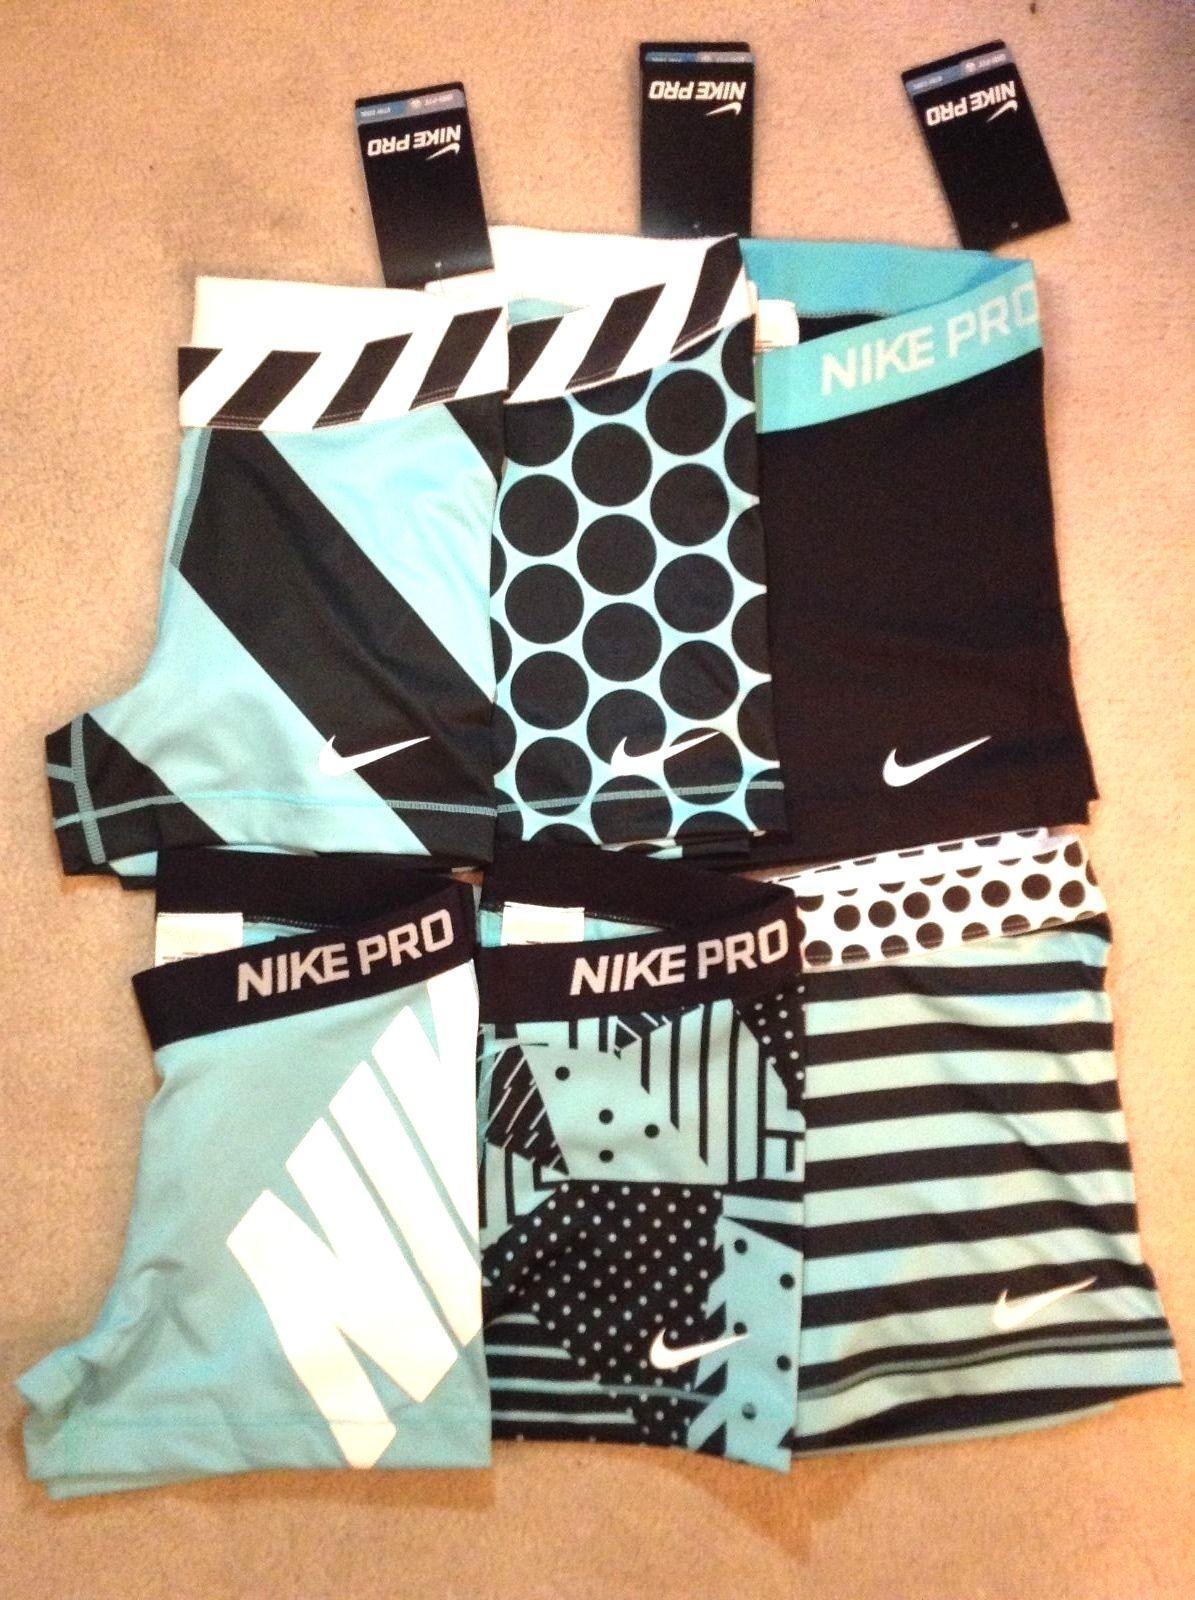 Nike Pro Shorts Compression 3 Spandex Light Aqua Printed Training Nwt Nike Outfits Nike Pros Nike Pro Shorts